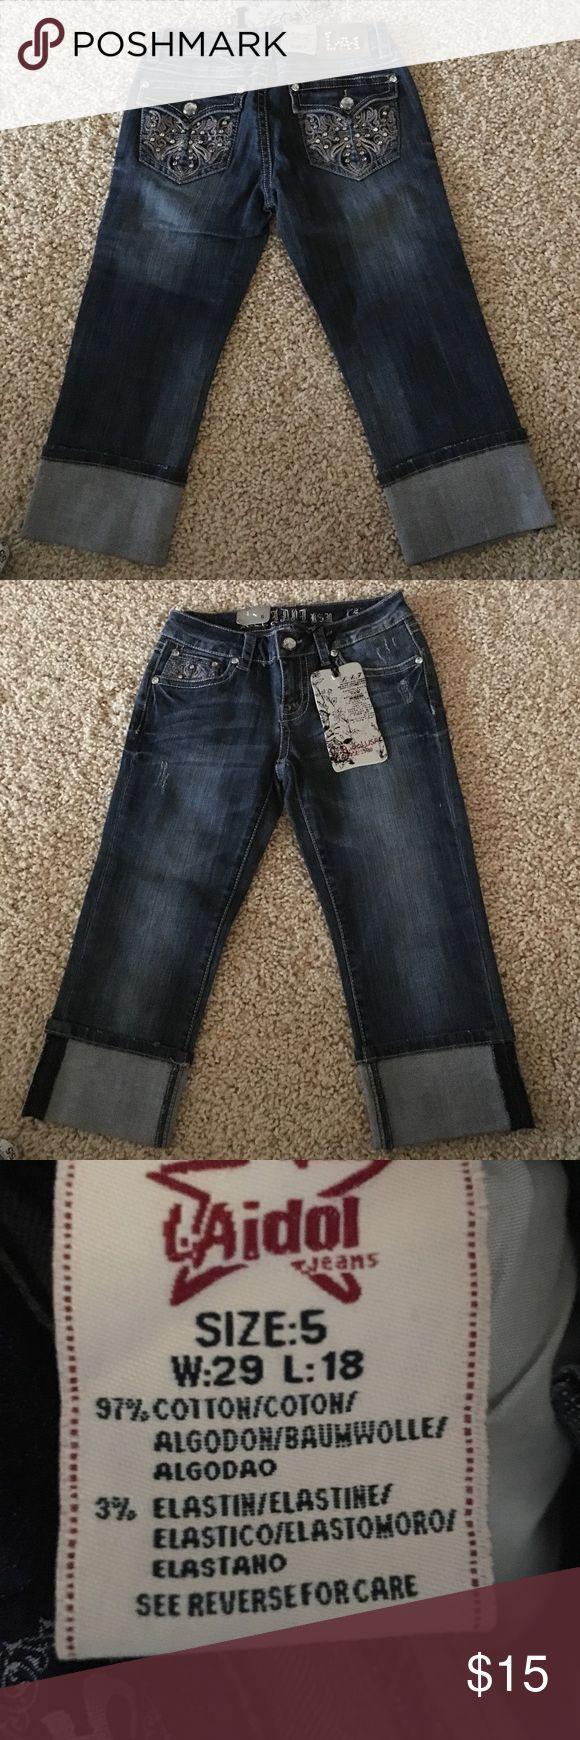 "NEW w/Tags LA IDOL Bling Capri Jeans Sz 5 Dark blu NEW w/Tags LA IDOL Capri Jeans Sz 5. Tag says 29 waist Measurement is more a 28"". 8"" Rise SUPER CUTE BLING POCKET Cuffed leg can be unrolled LA Idol Jeans"